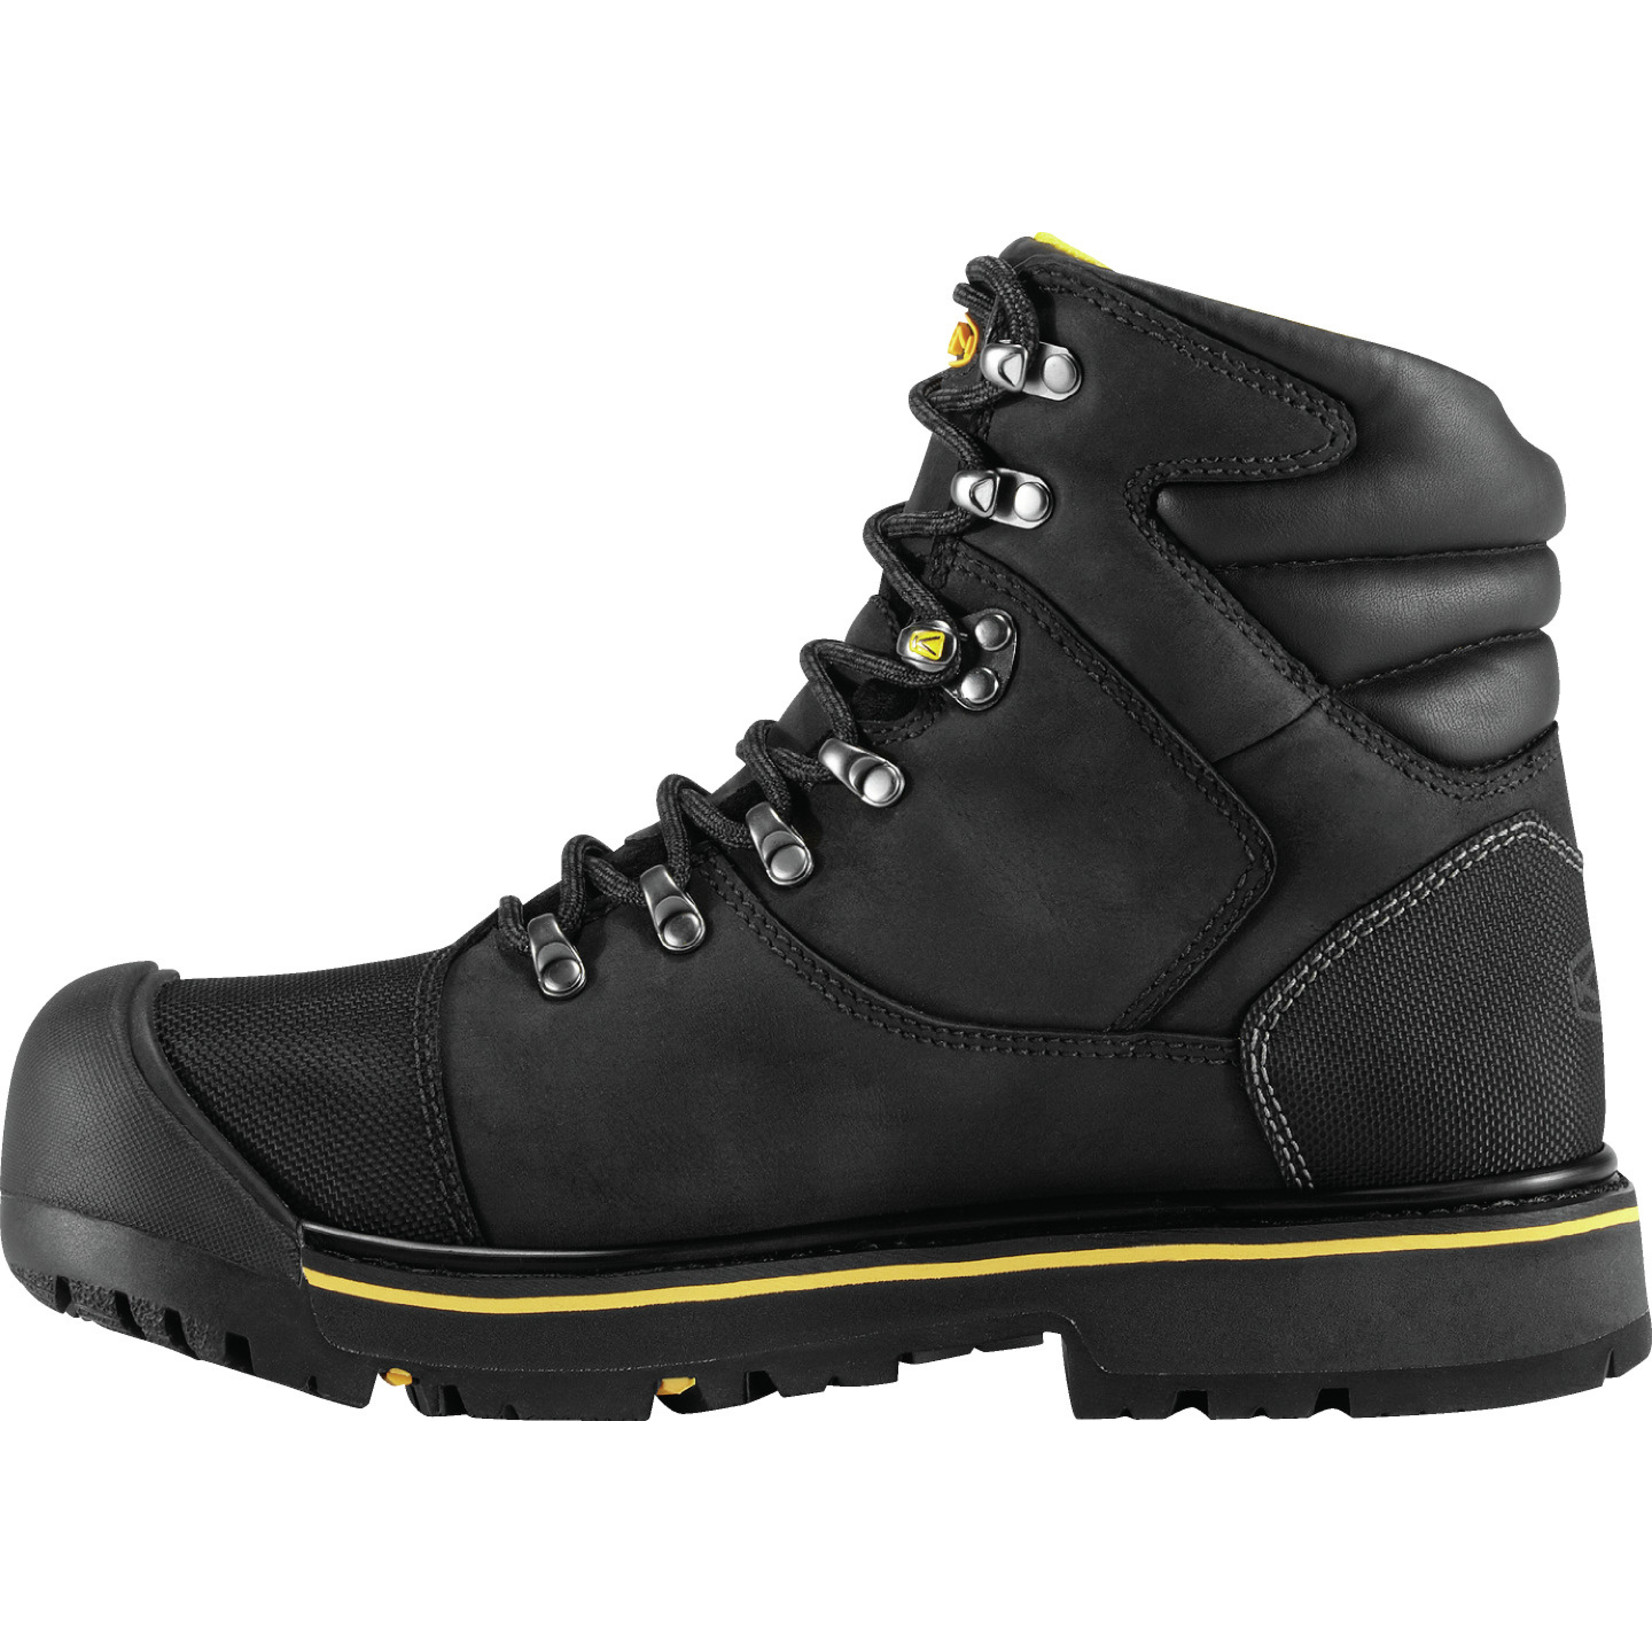 "Keen Men's Keen 6"" Steel Toe Waterproof Milwaukee Black 1009173"